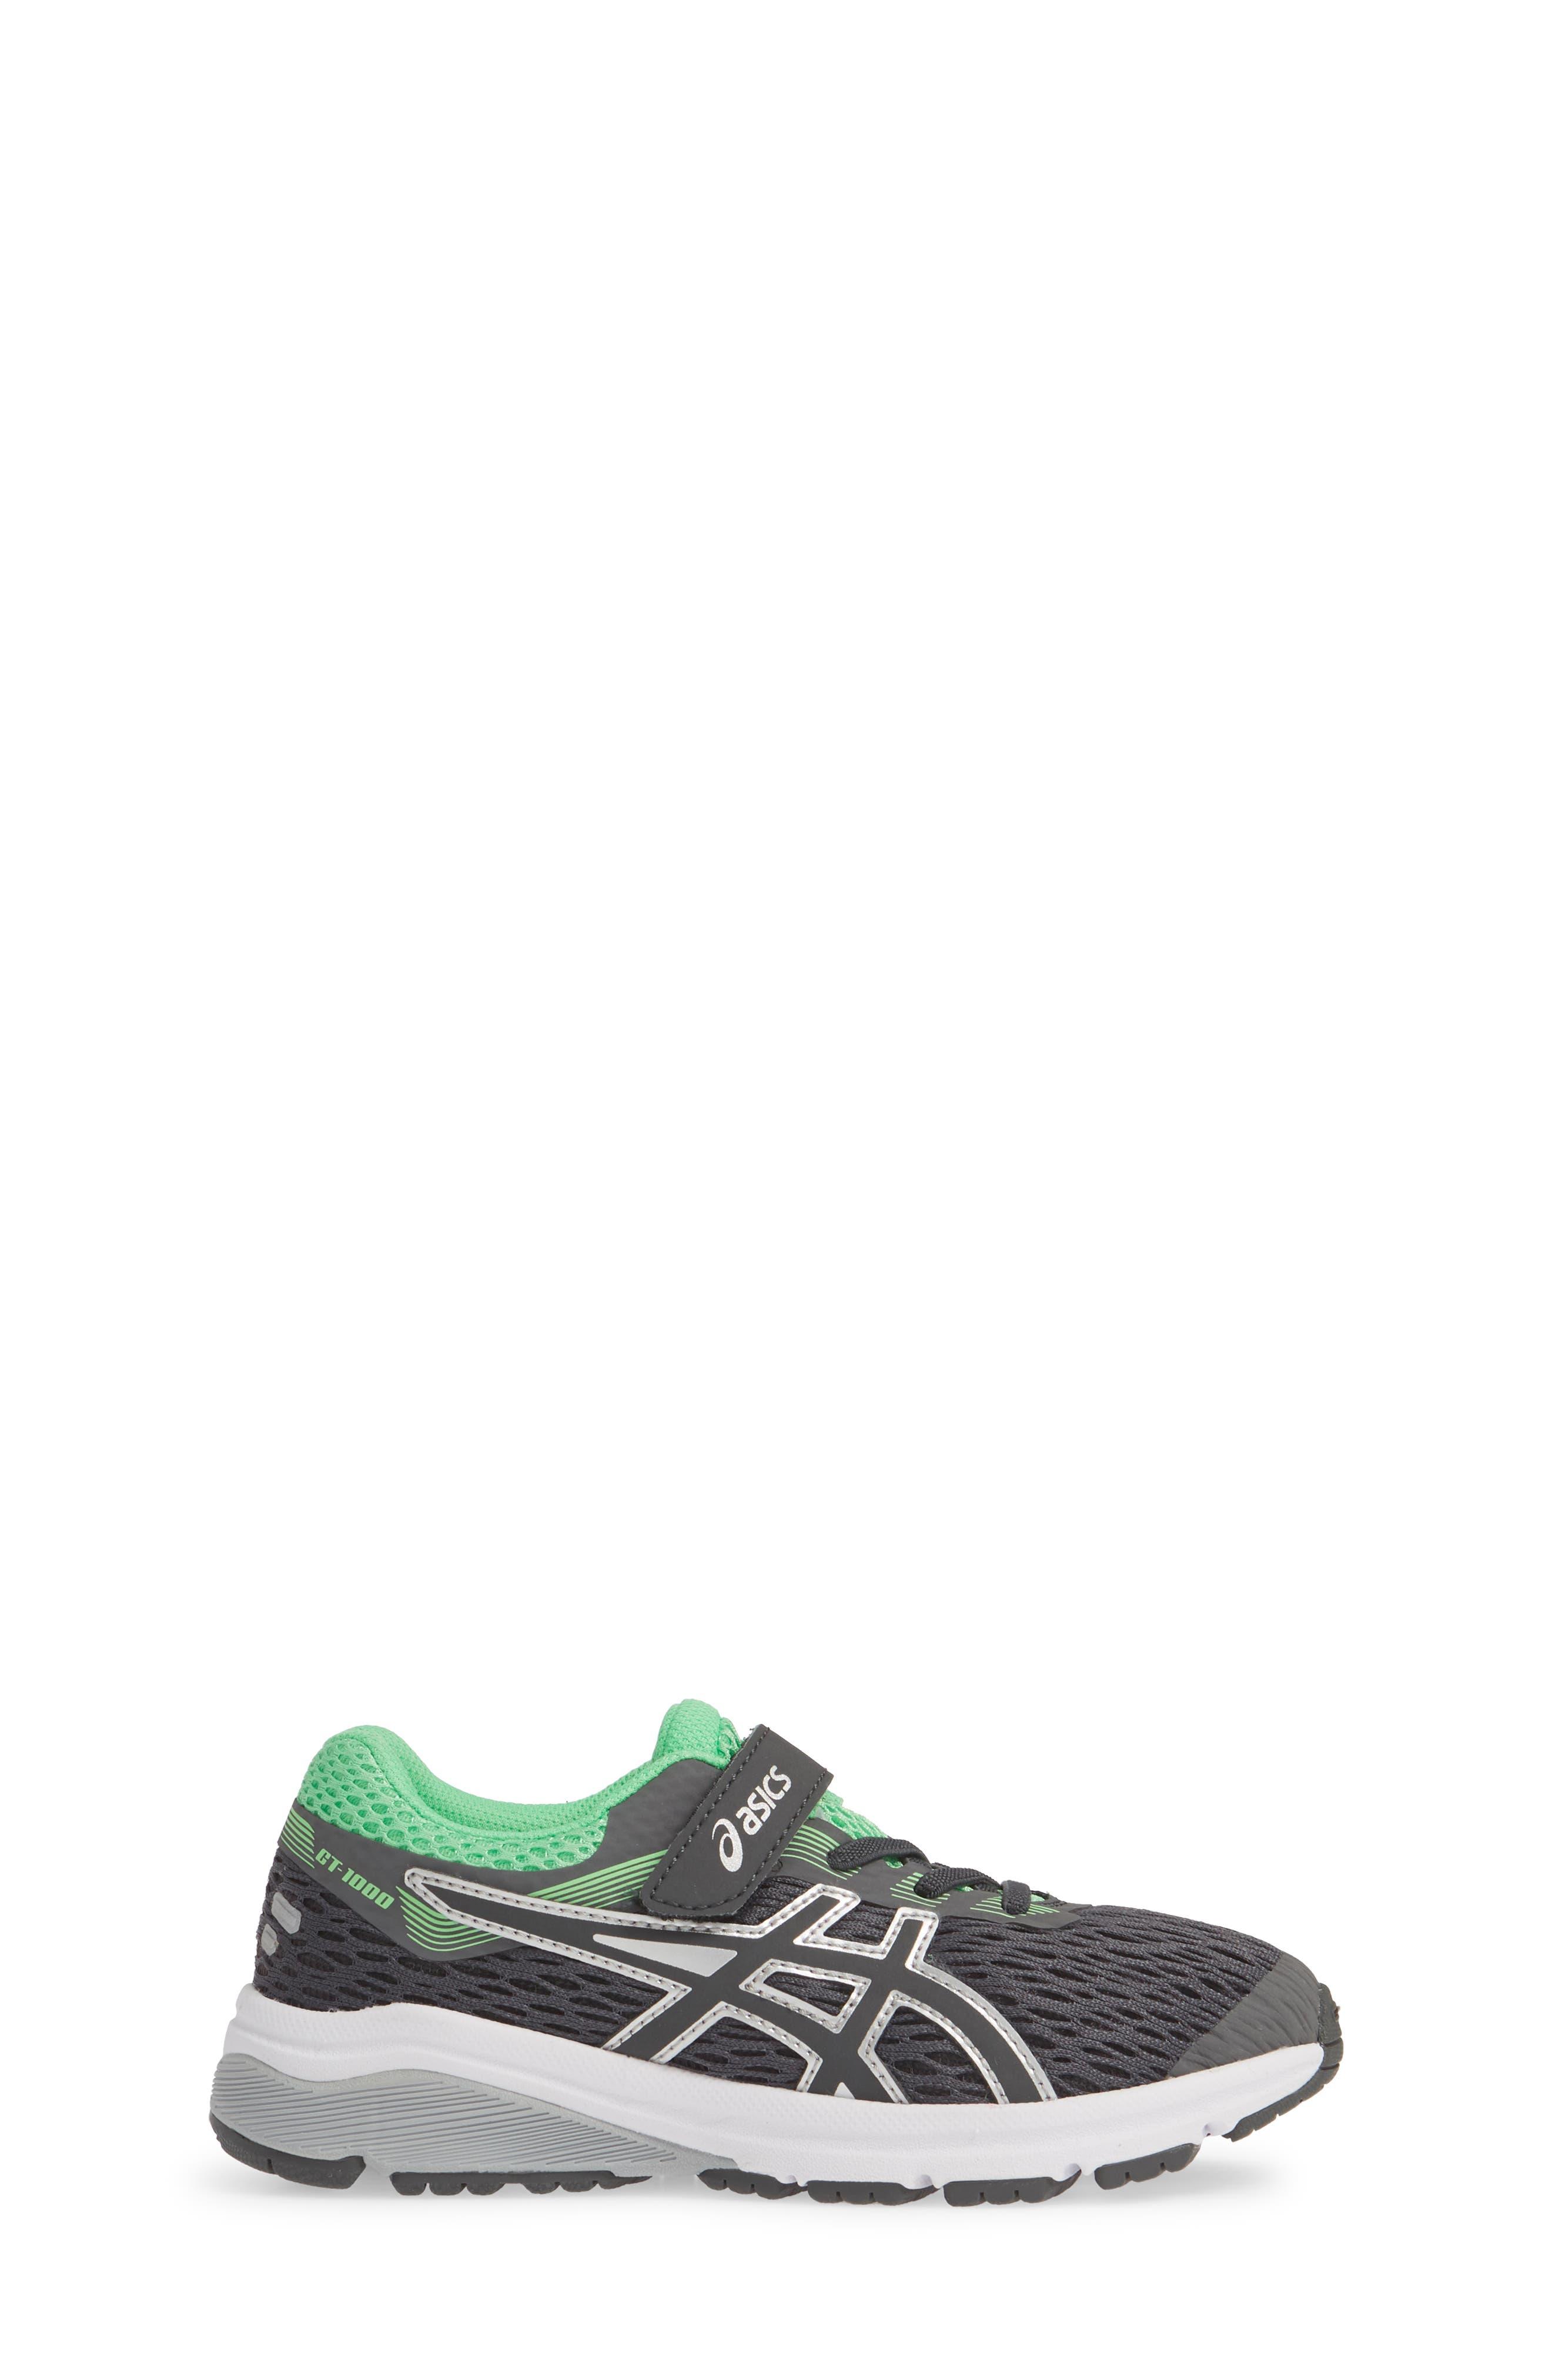 ASICS<SUP>®</SUP>, GT 1000 7 Running Shoe, Alternate thumbnail 3, color, DARK GREY/ DARK GREY